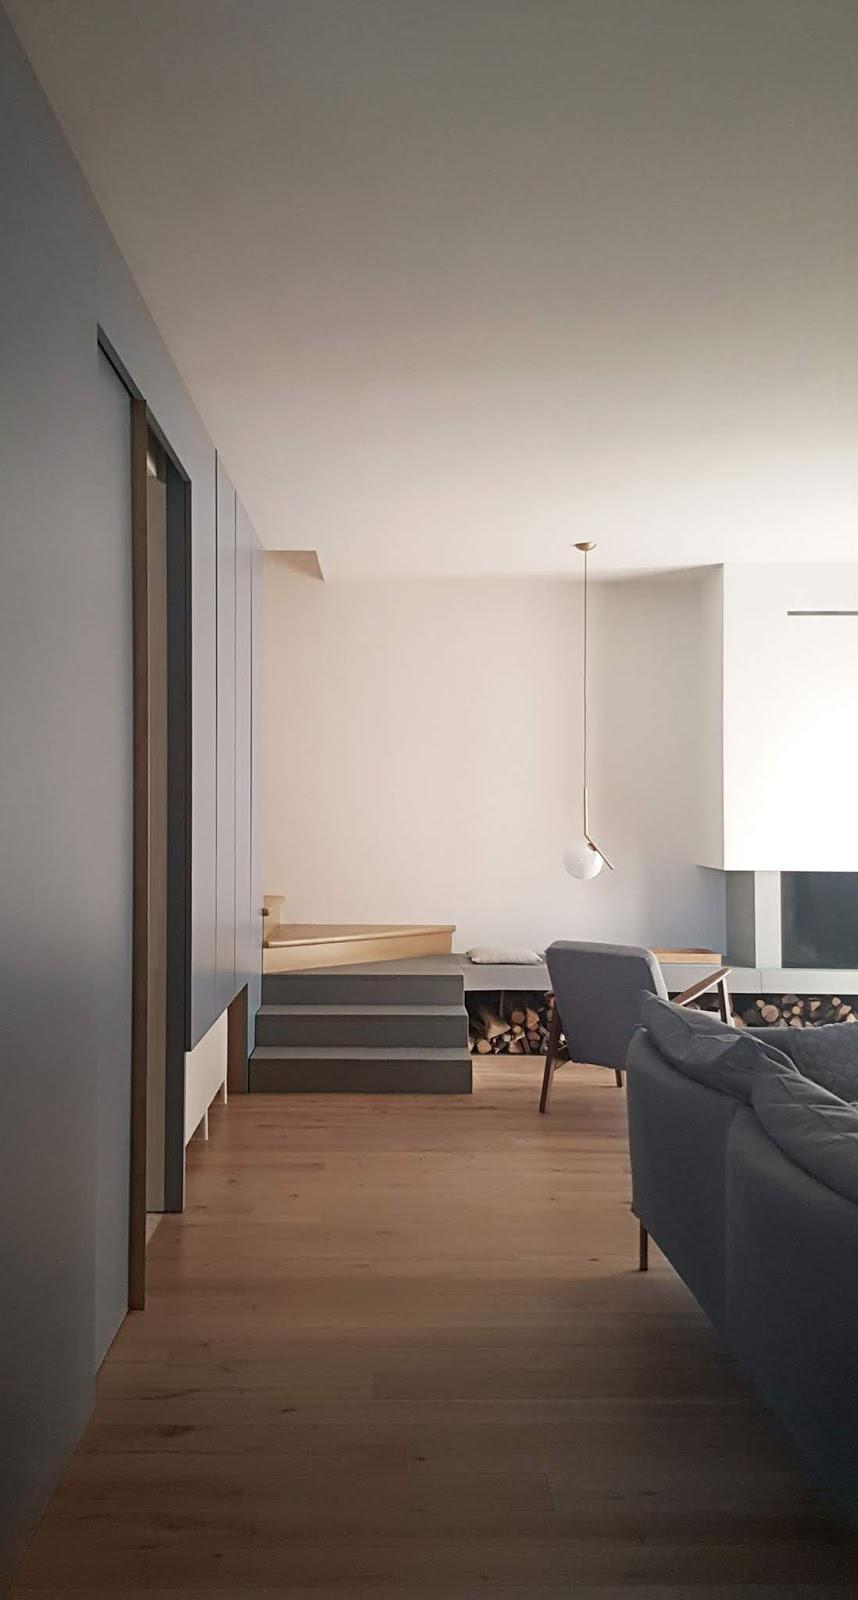 Architettura And Design simplicity love: numero trenta, italy | opps architettura